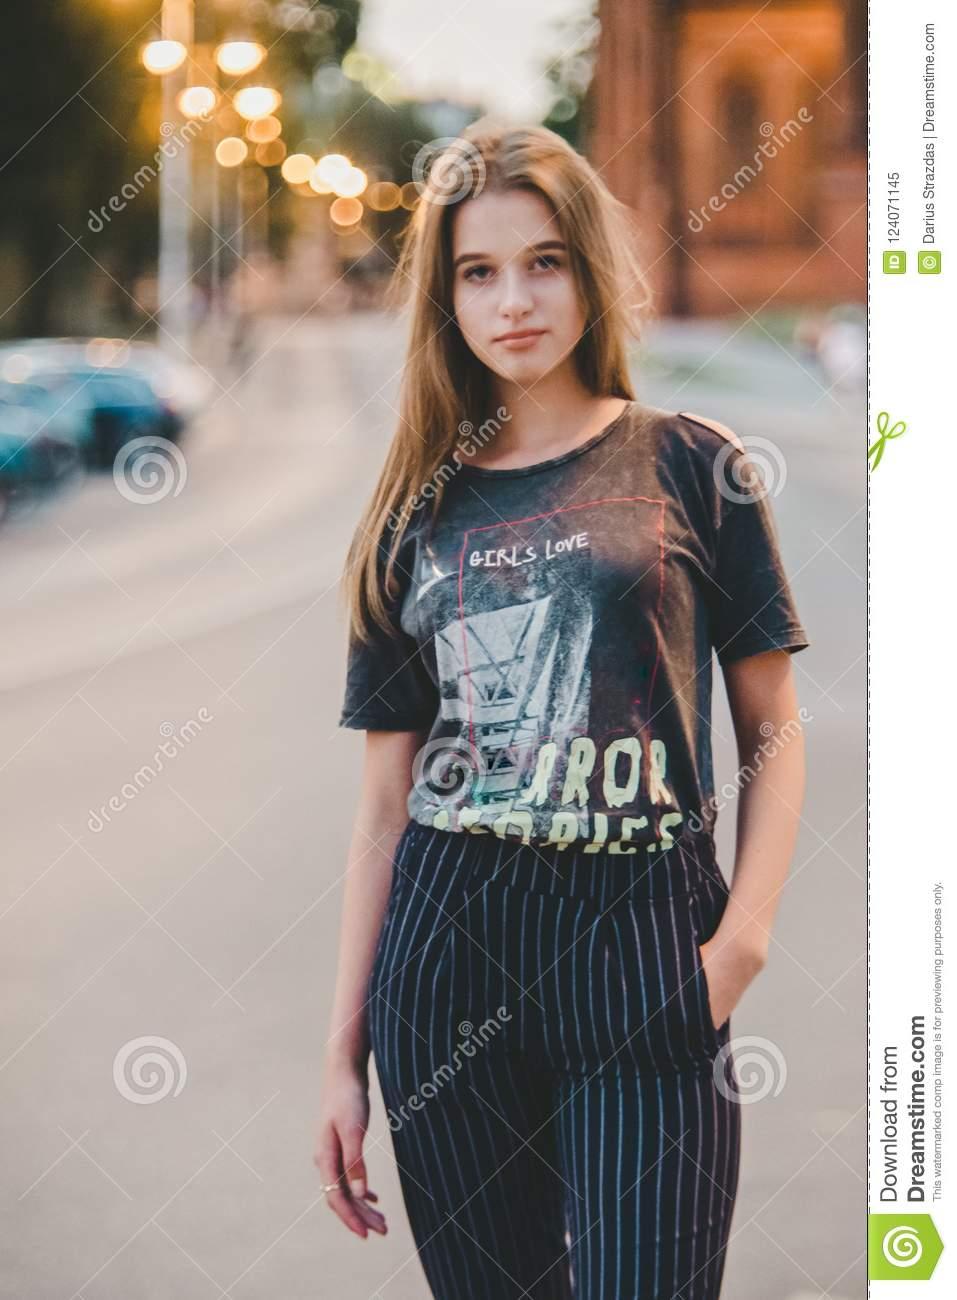 اجمل صور بنات 2020 اجمل صور بنات اطفال خلفيات بنات صغيره جميلة جدا 67